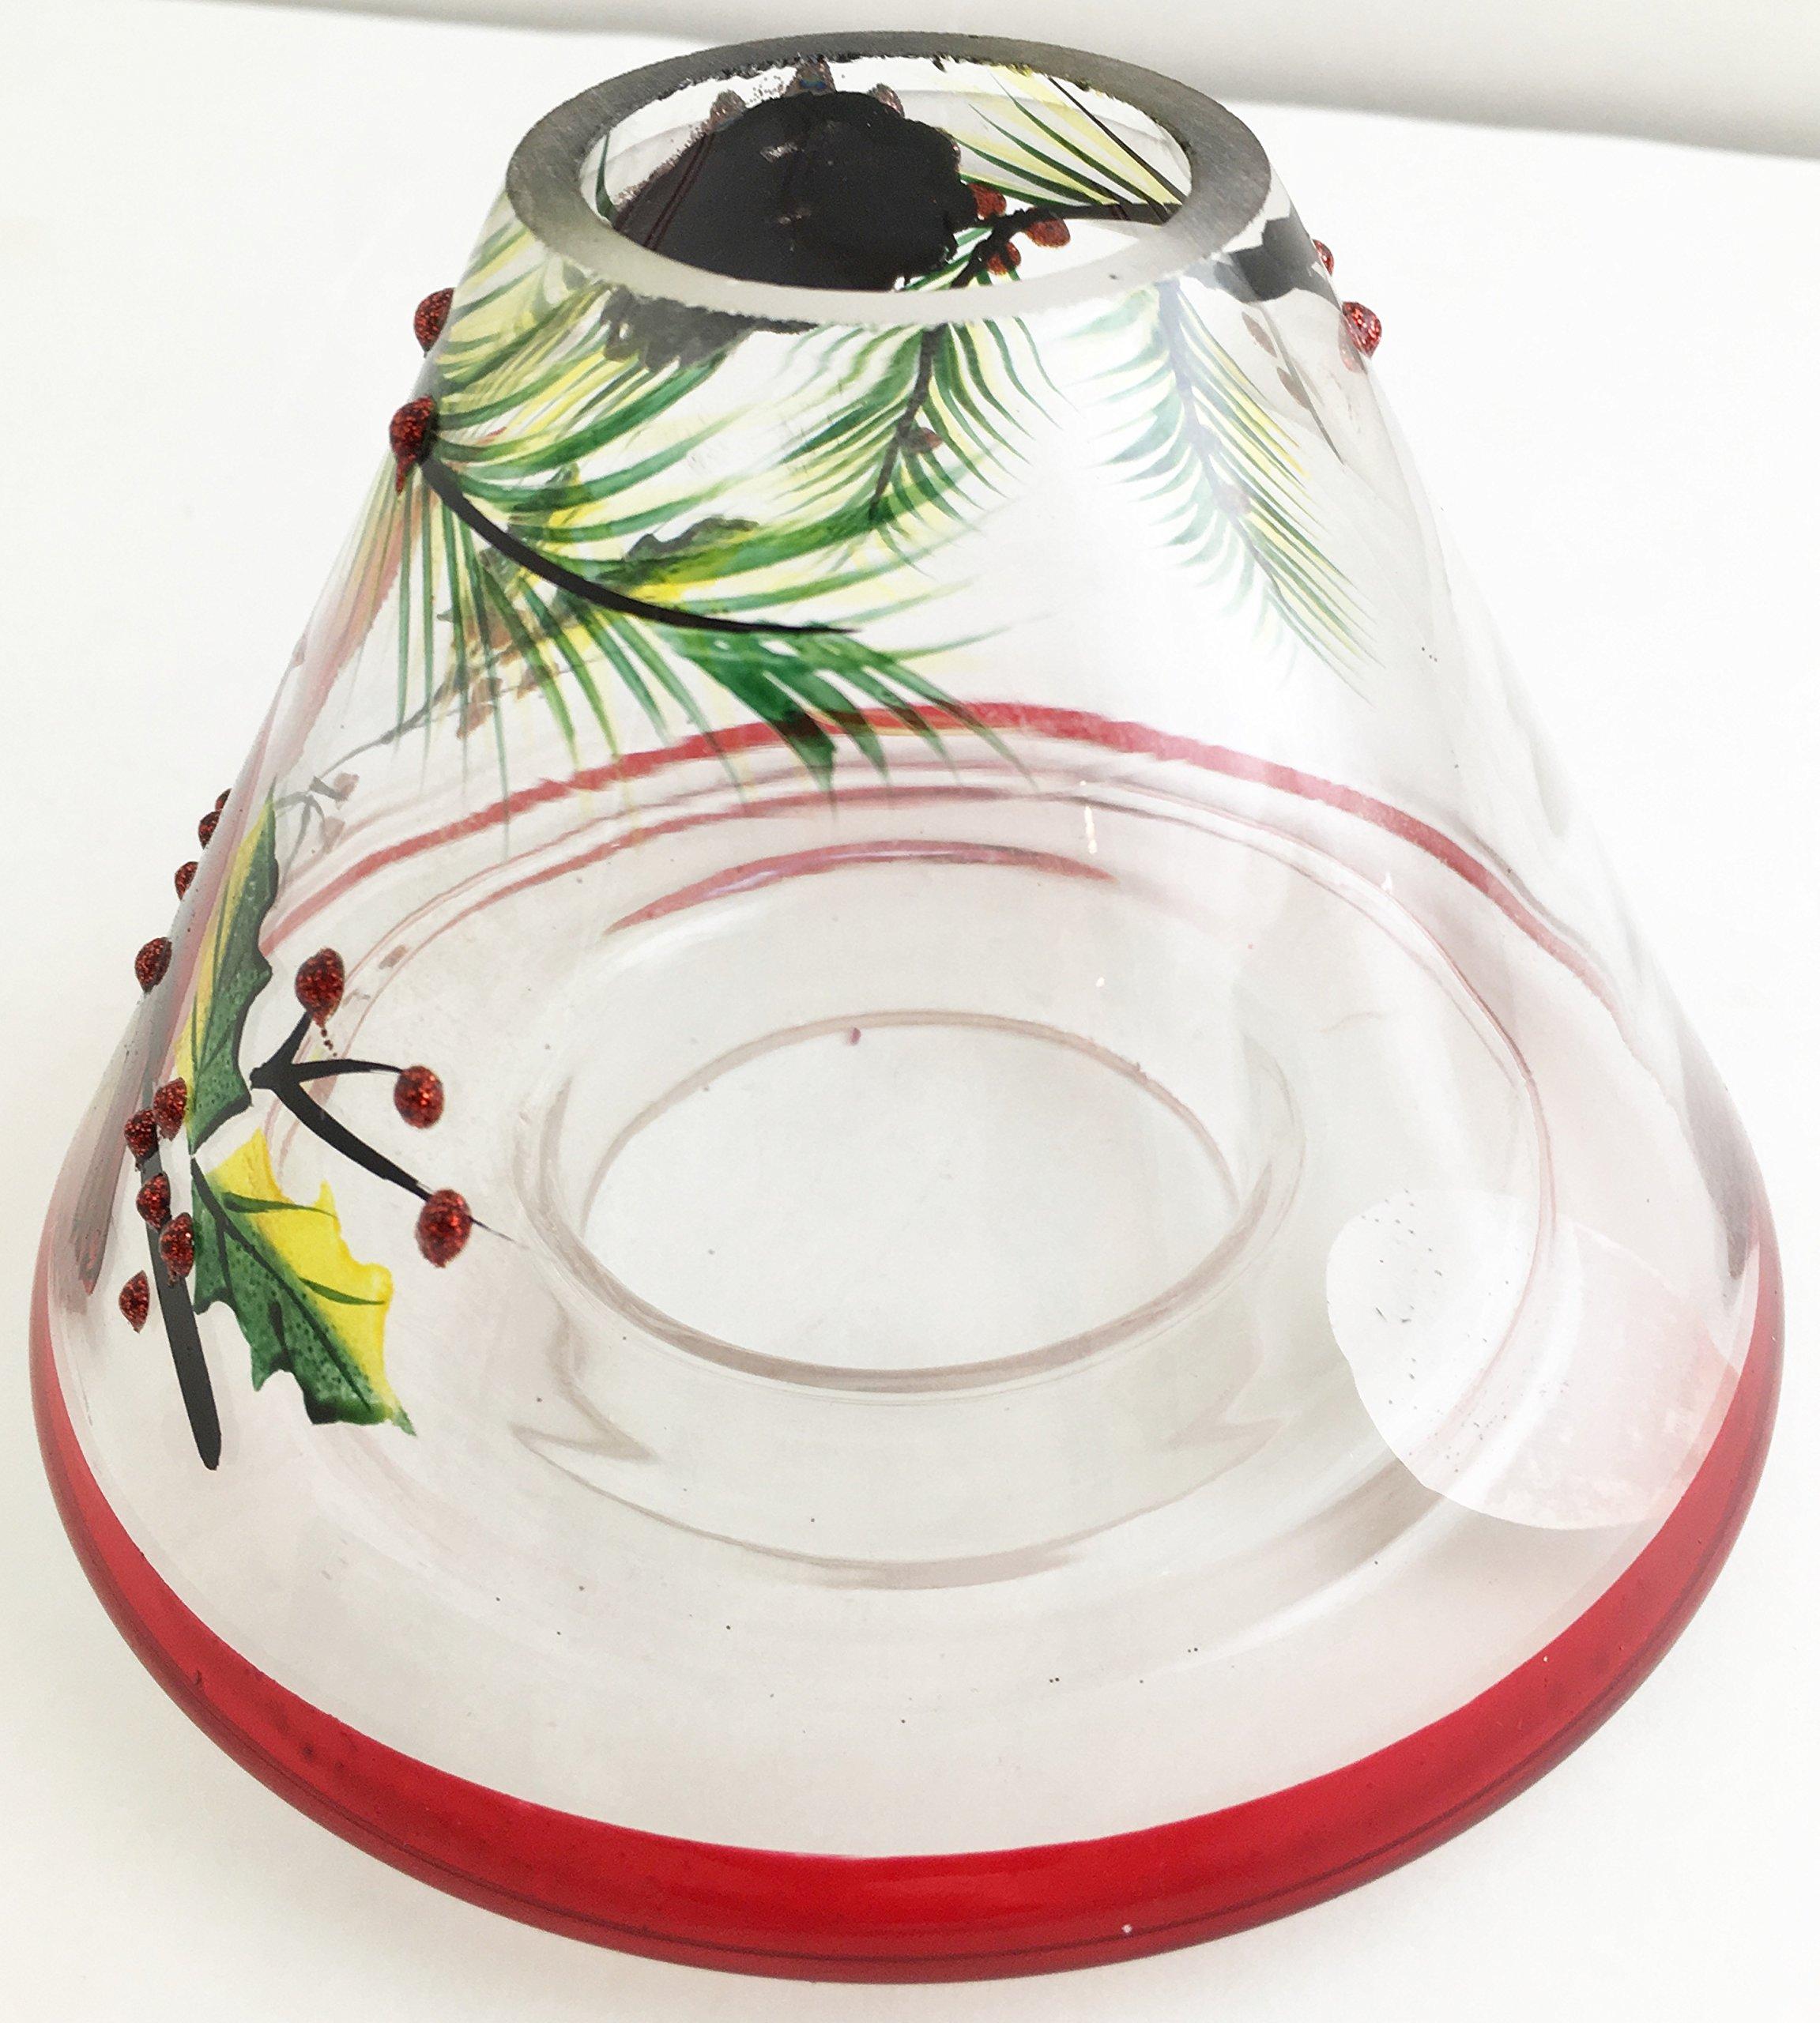 Biedermann & Sons Handpainted Jar Shades, Cardinal Scene, 4-Count by Biedermann & Sons (Image #4)